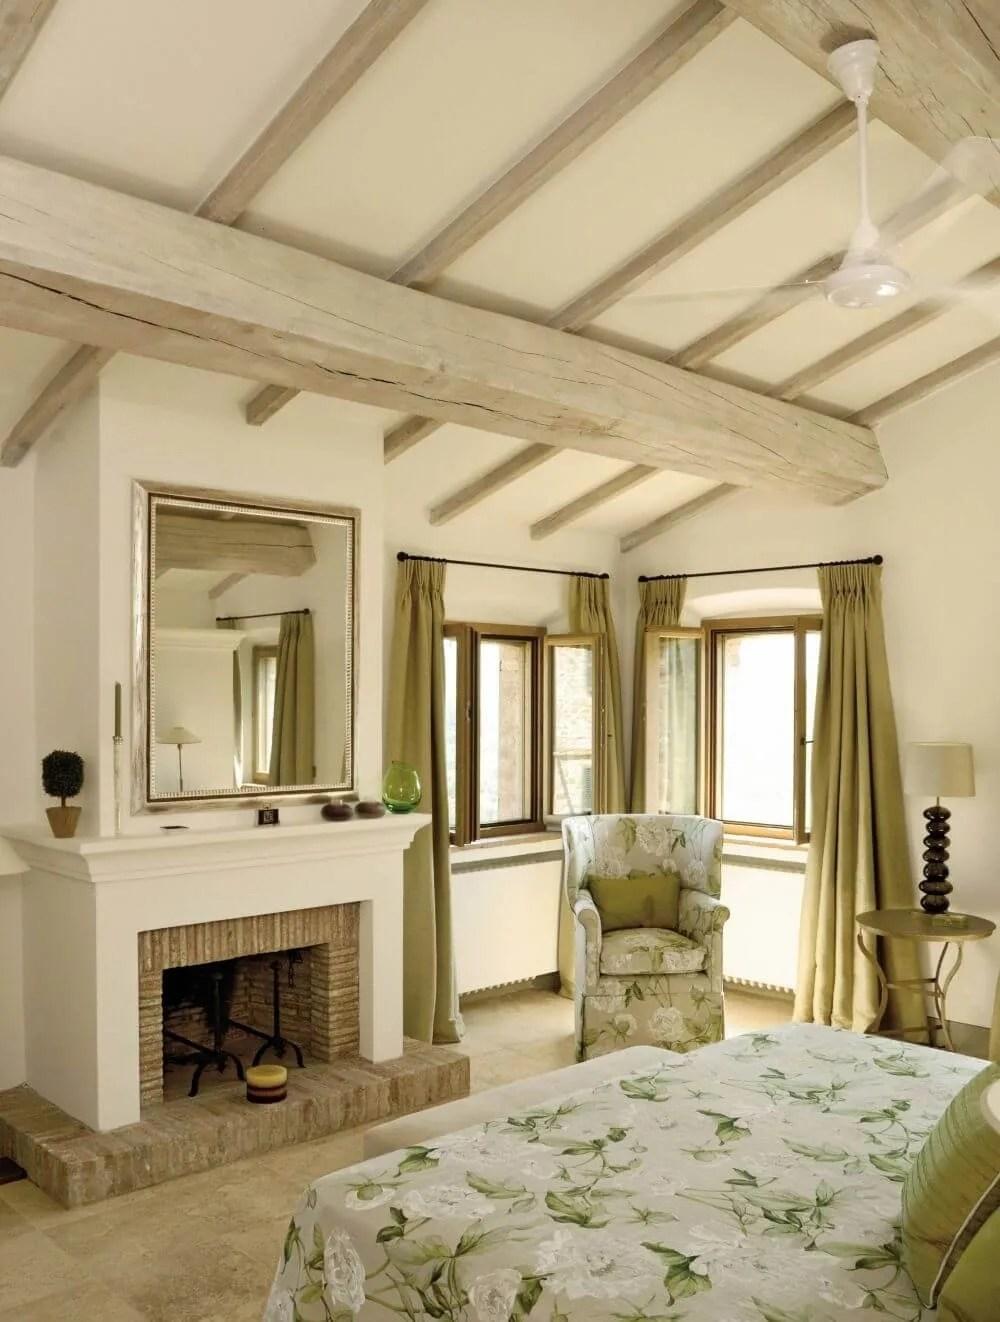 8 farmhouse inspired bedroom designs - https://interioridea/